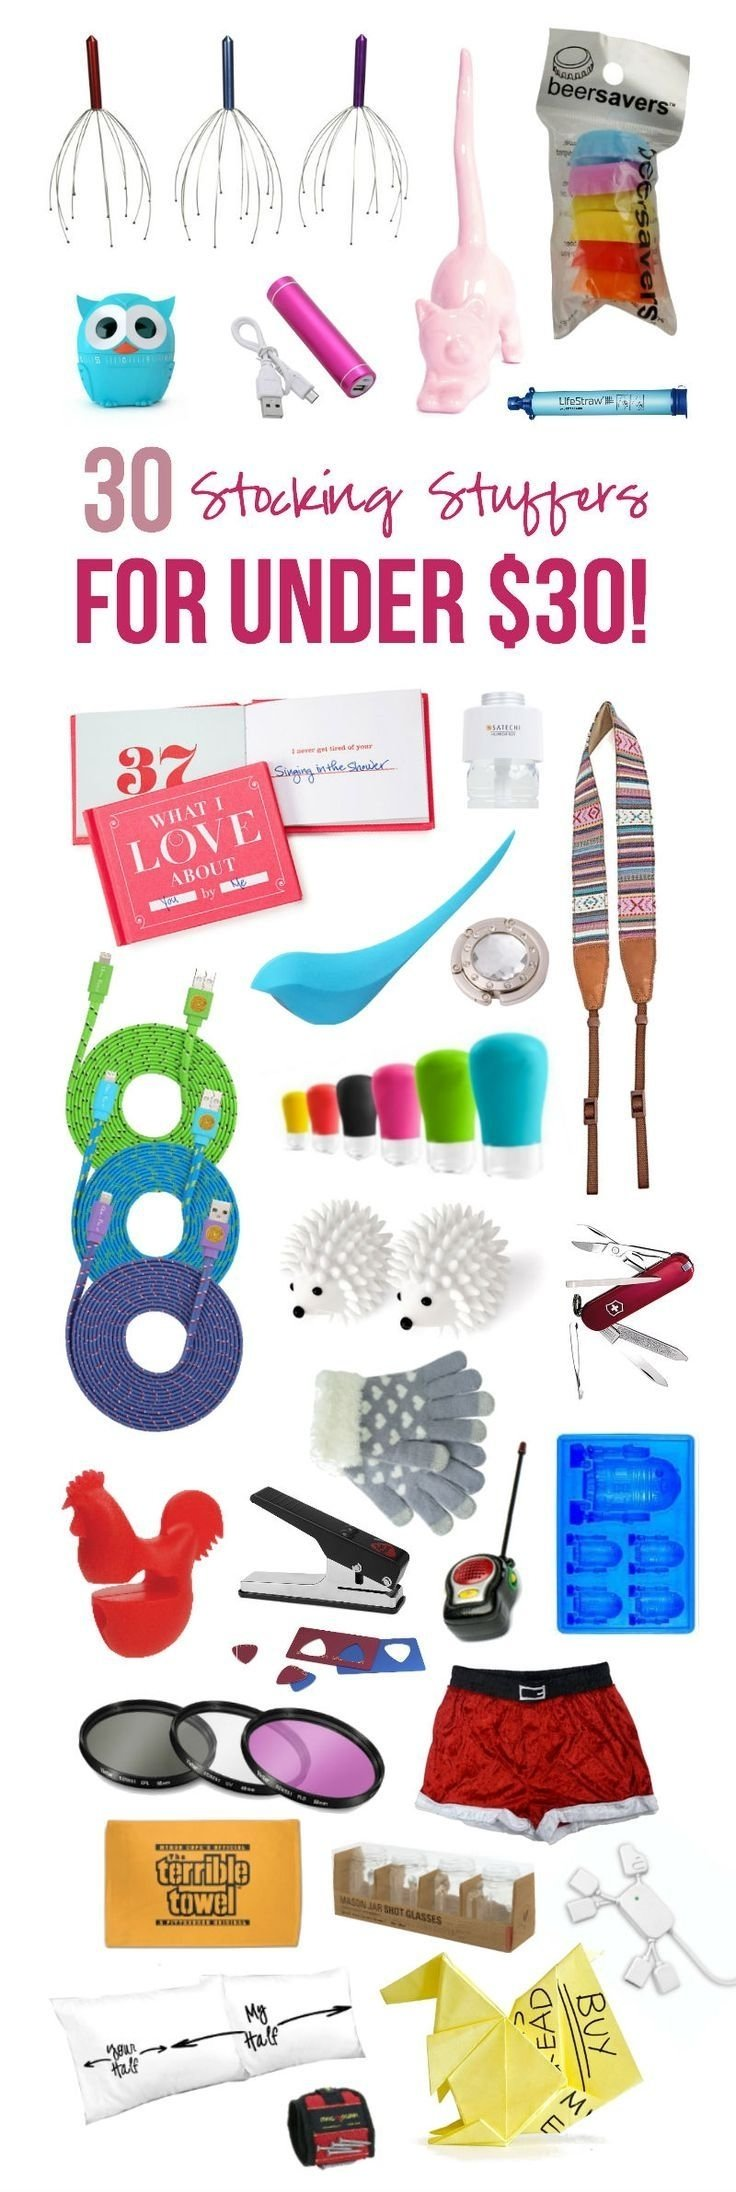 10 Wonderful Stocking Stuffer Ideas For Girlfriend 908 best stocking stuffers images on pinterest christmas presents